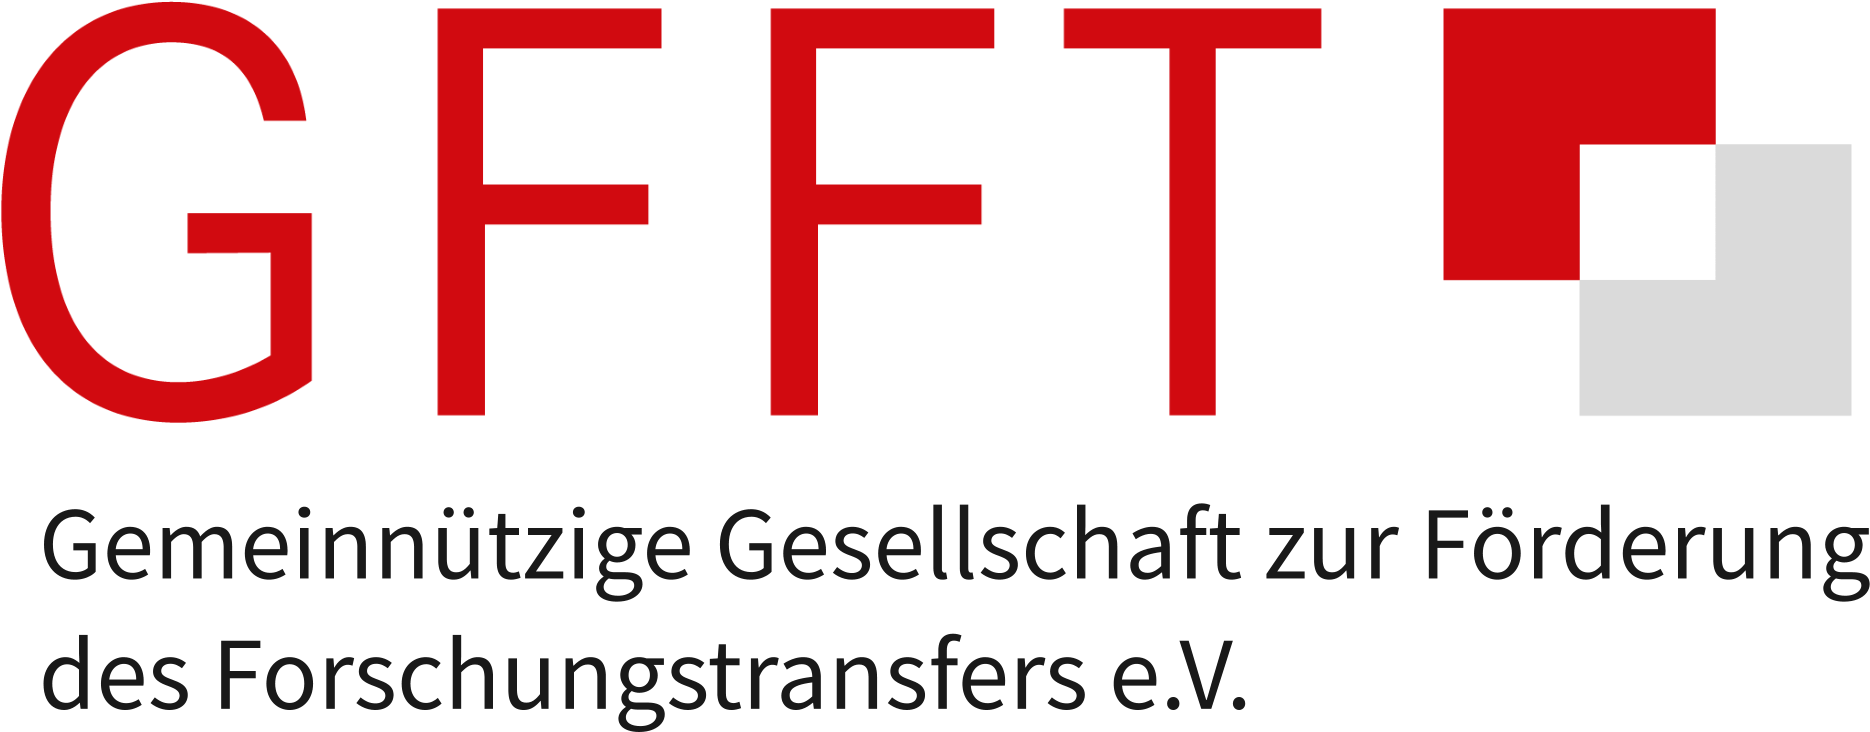 GFFT Logo